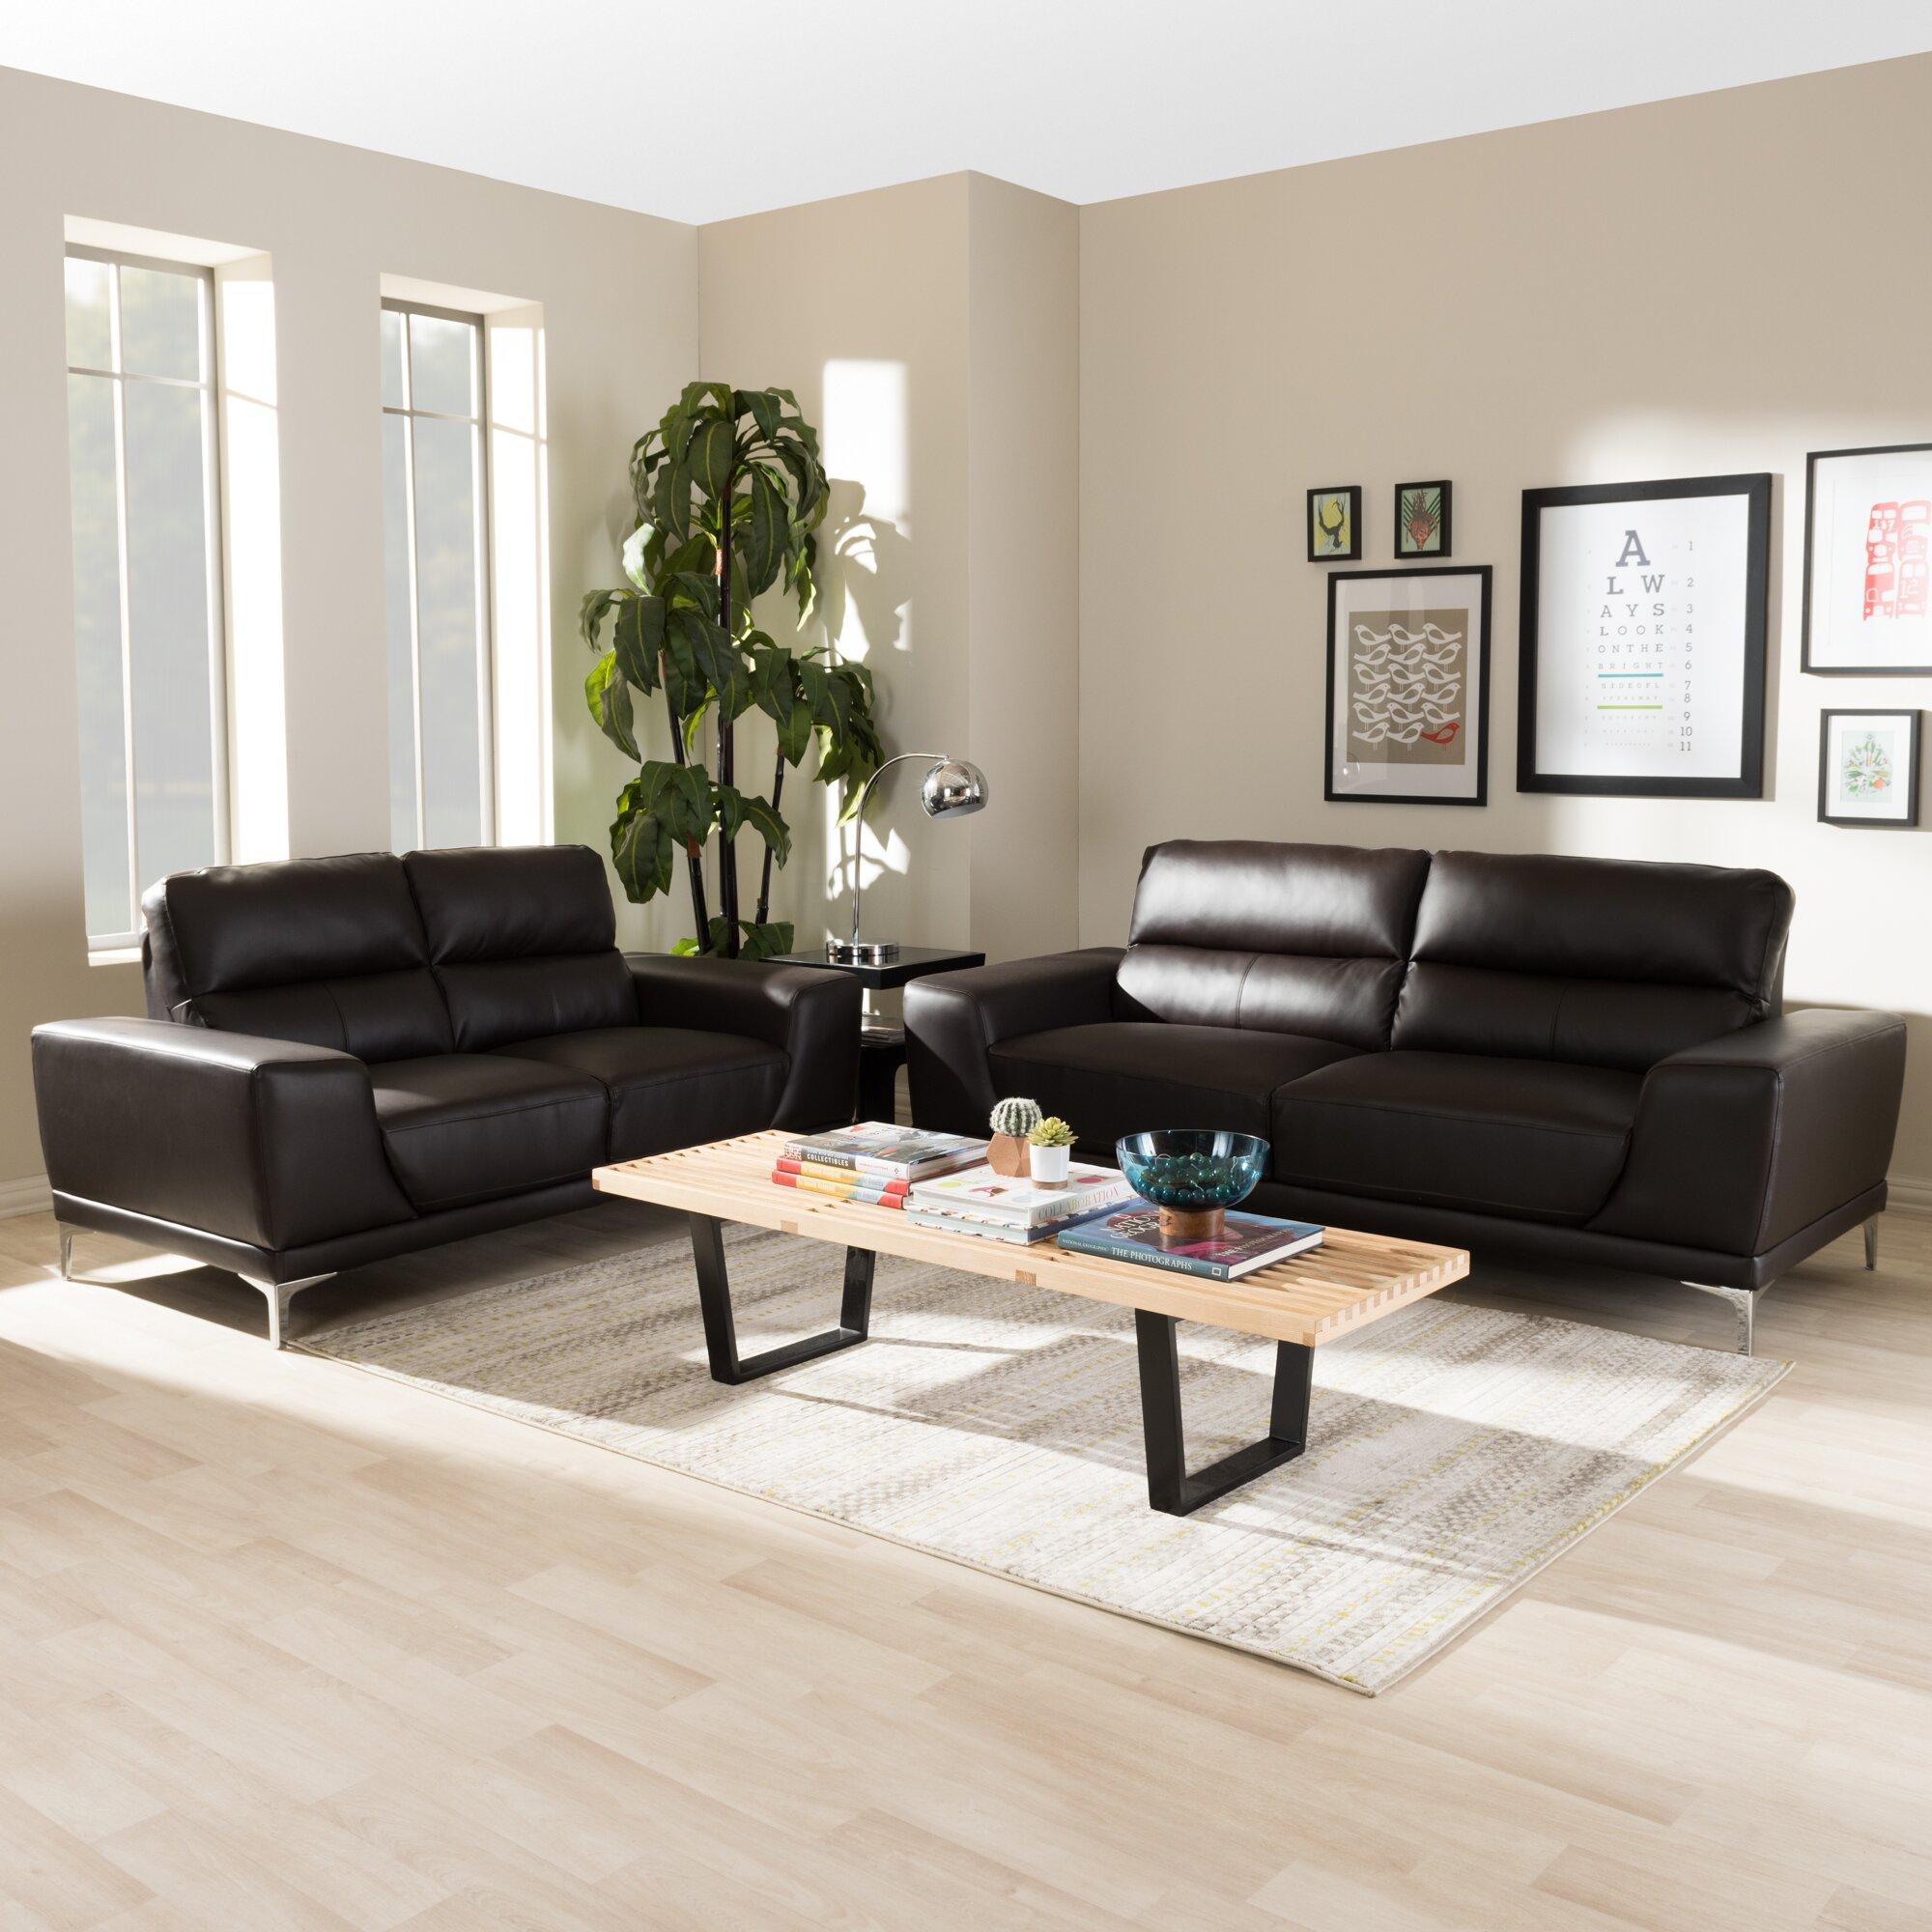 Wholesale interiors baxton studio lambton 2 piece living room set